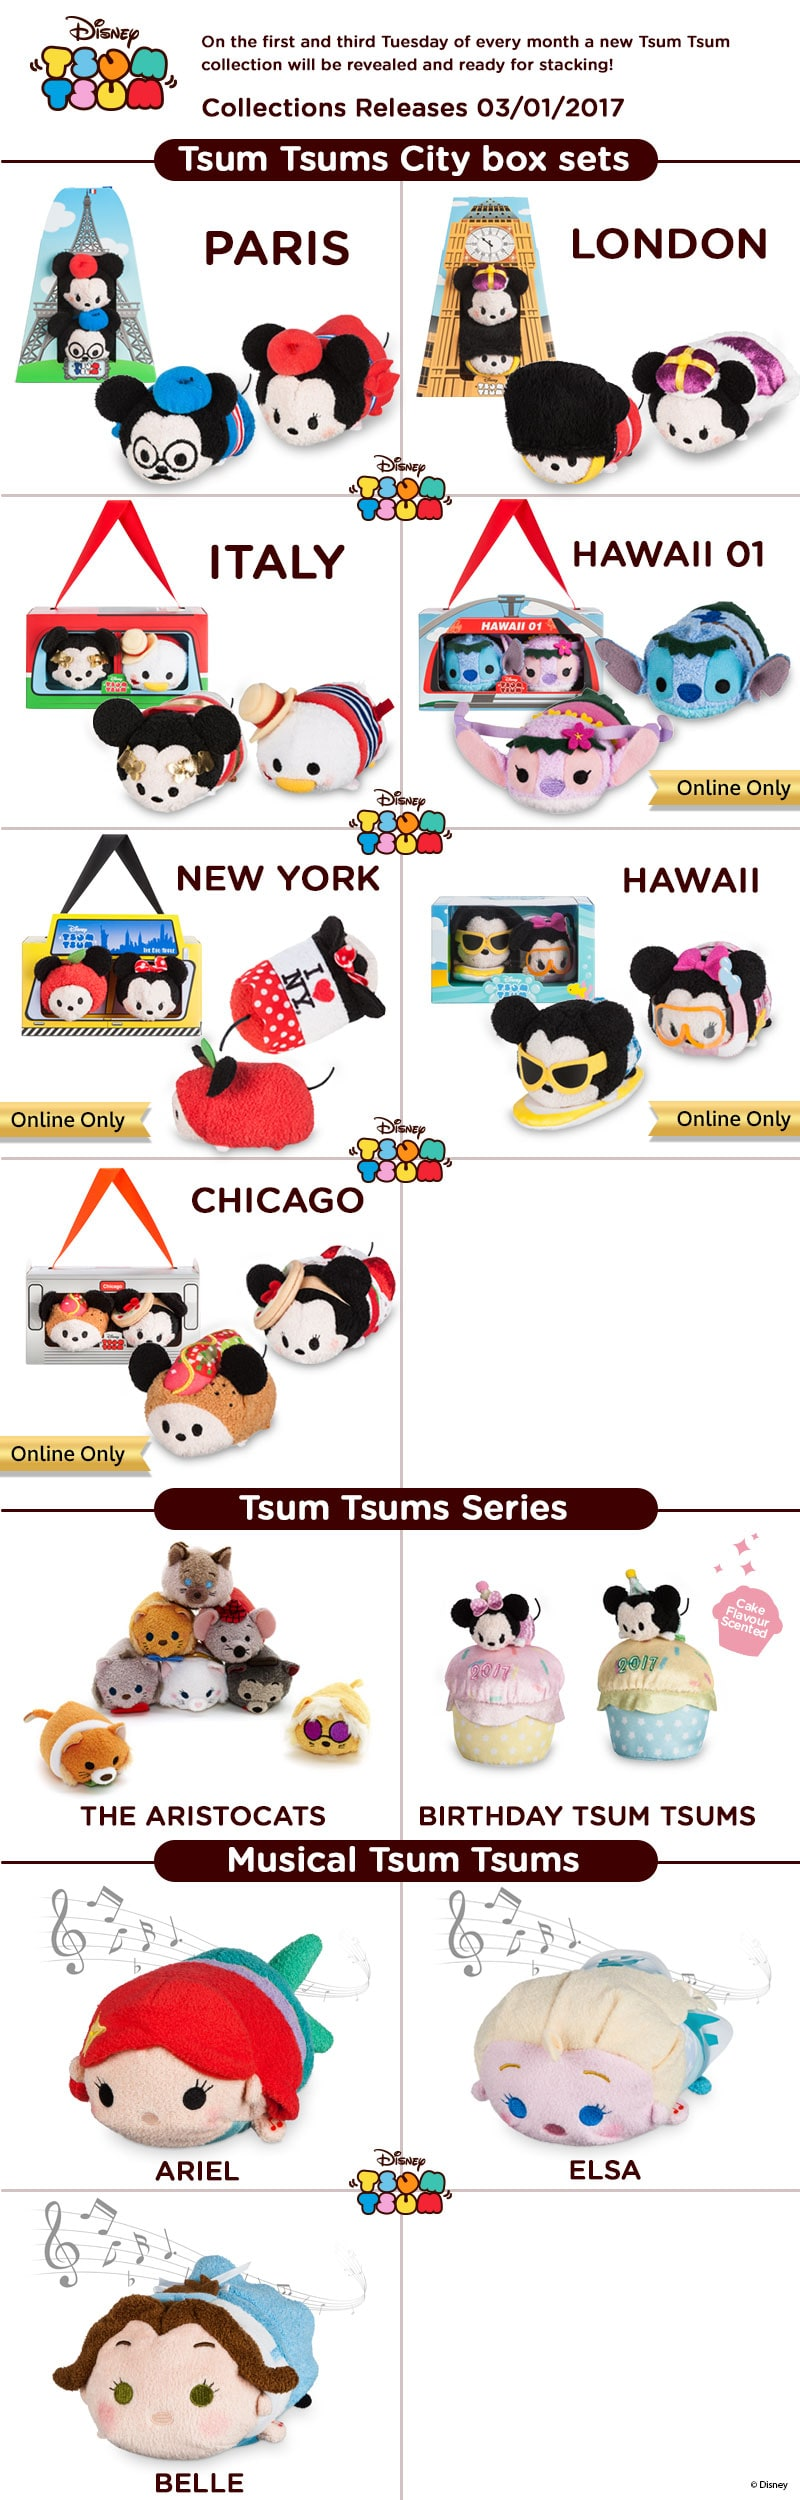 Tsum Tsum City Box, Birthday & Musical Sets Coming Soon